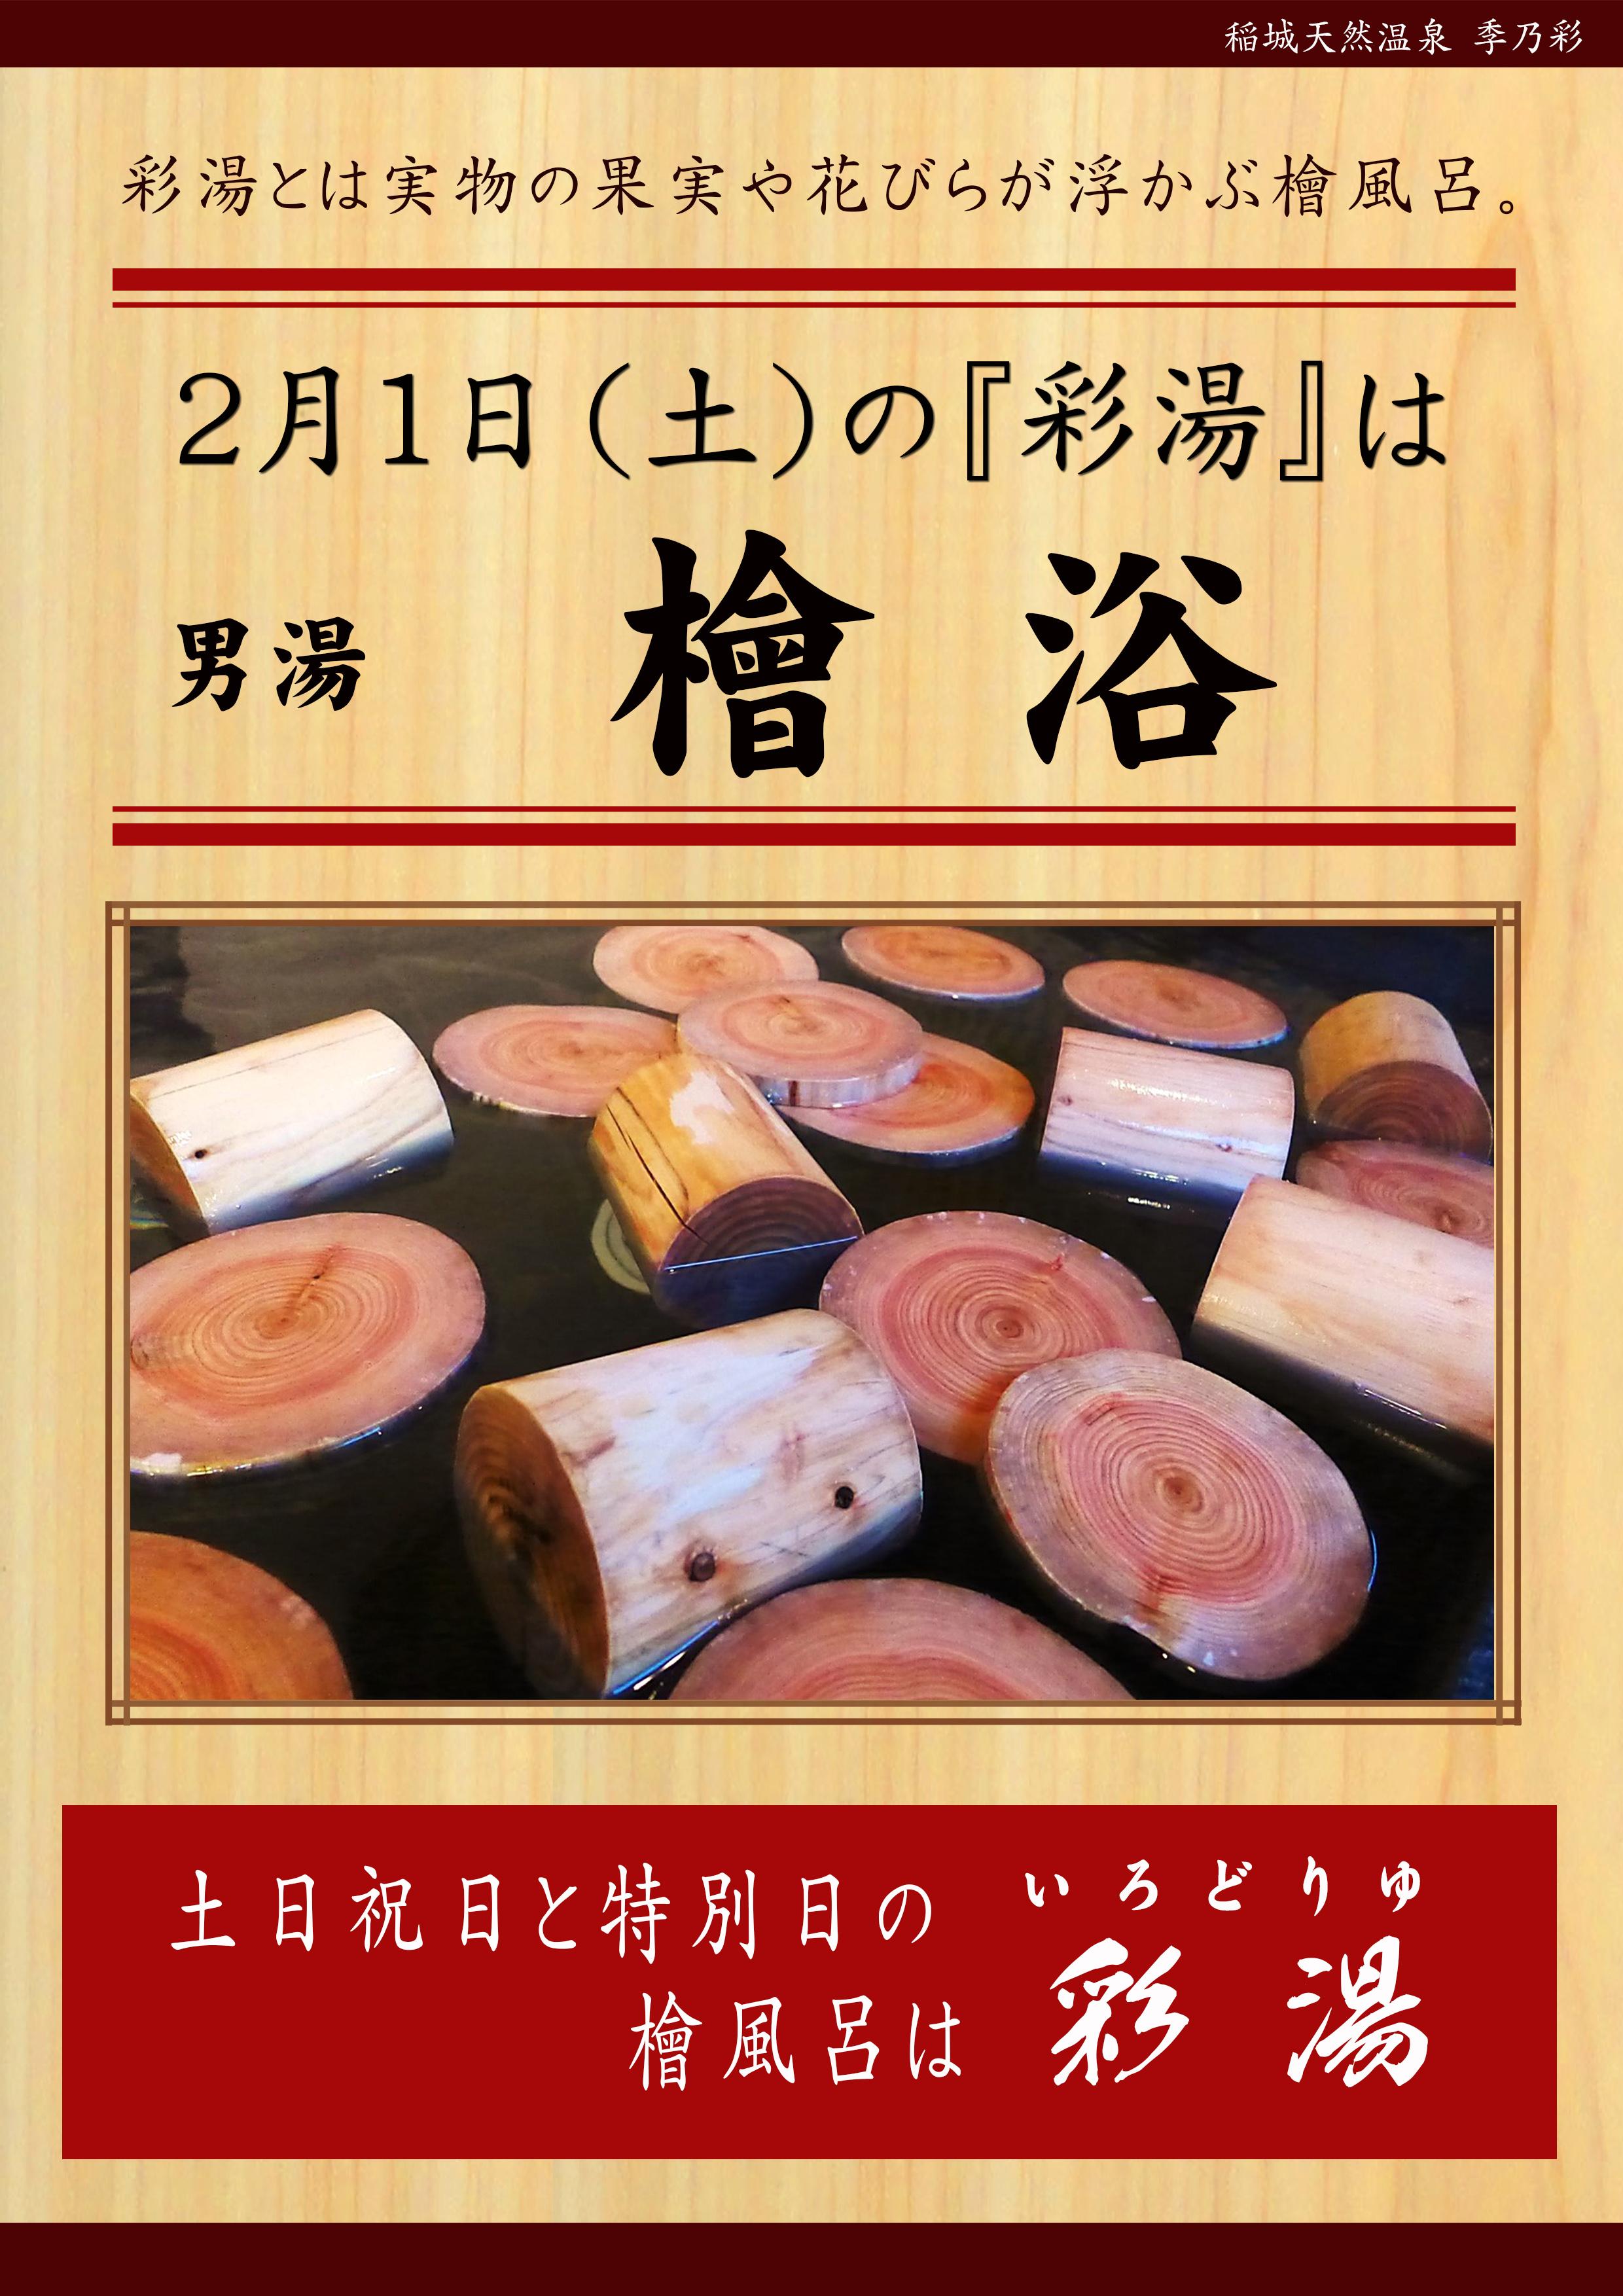 200201 POP イベント 彩湯 男女 檜浴